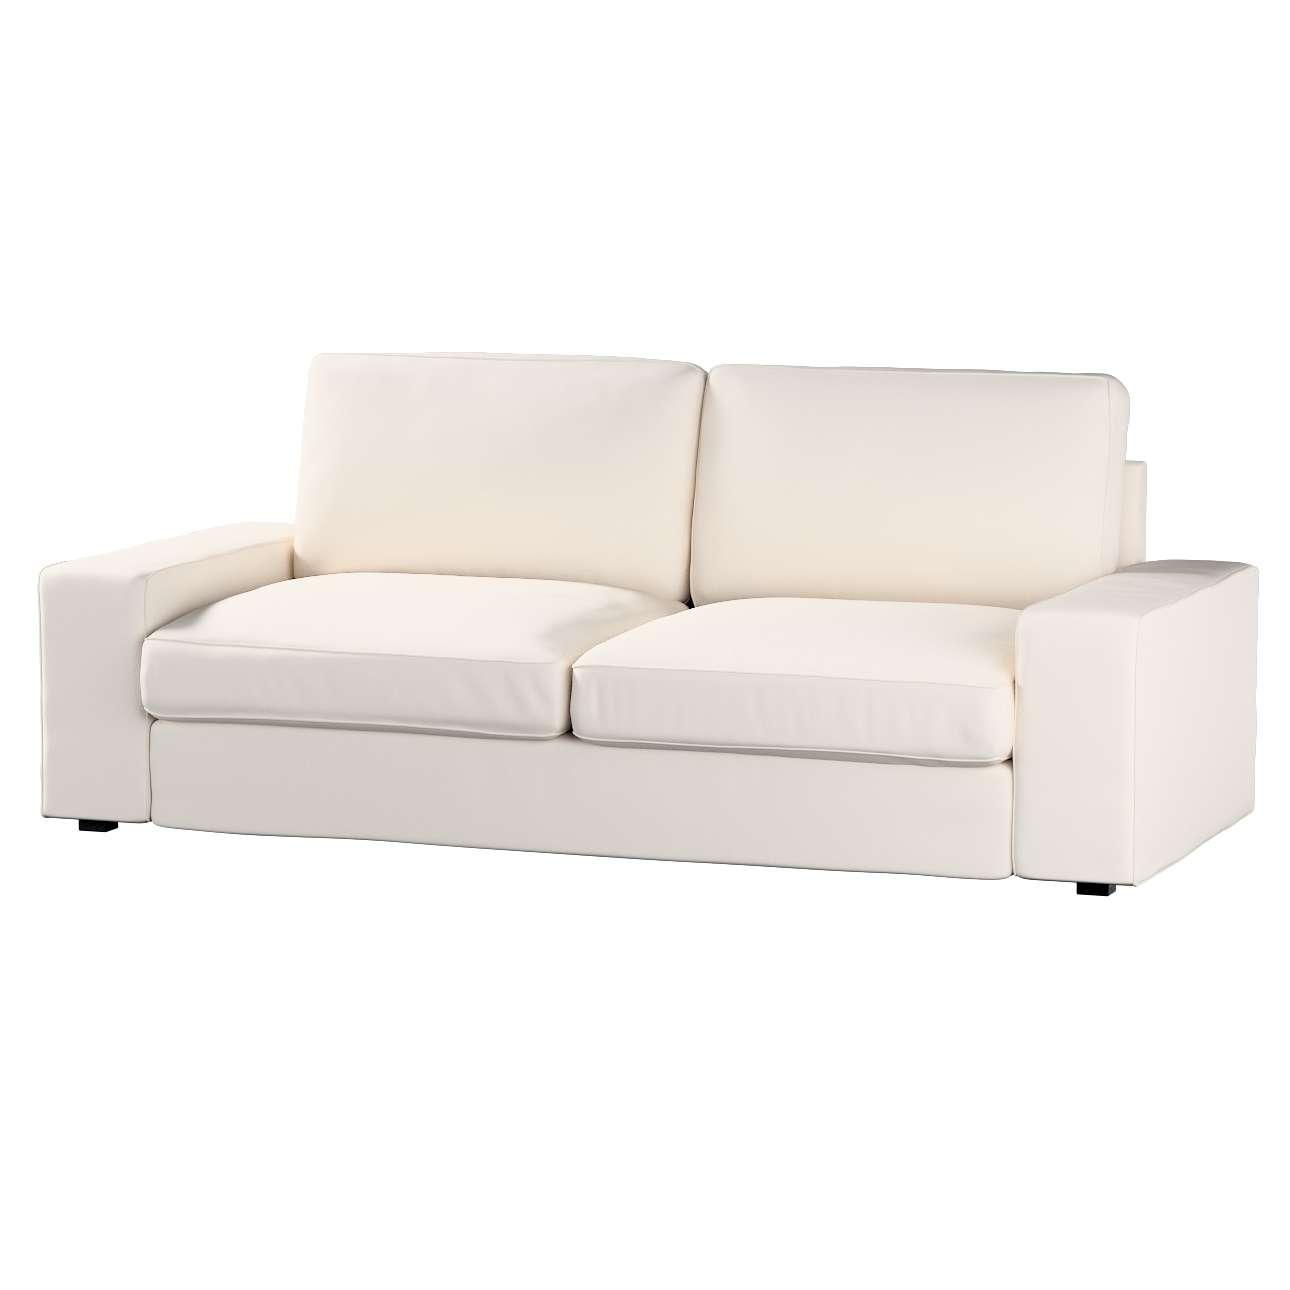 Kivik 3-Sitzer Sofabezug Sofa Kivik 3-Sitzer von der Kollektion Etna, Stoff: 705-01